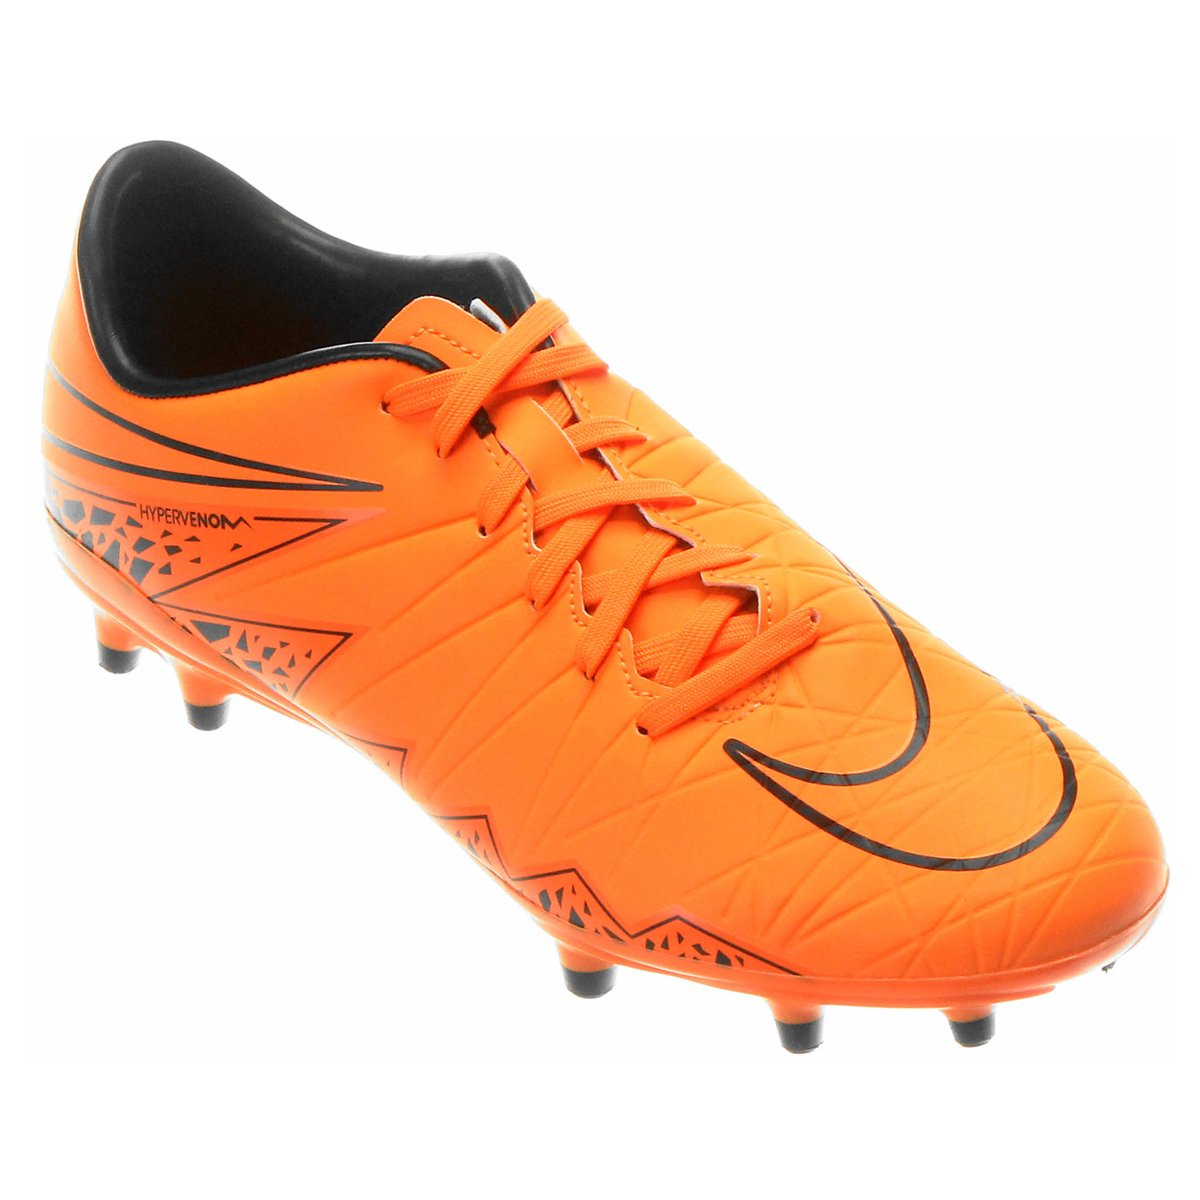 ec7ee7bf75 Chuteira Campo Nike Hypervenom Phelon 2 FG Masculina - Compre Agora ...